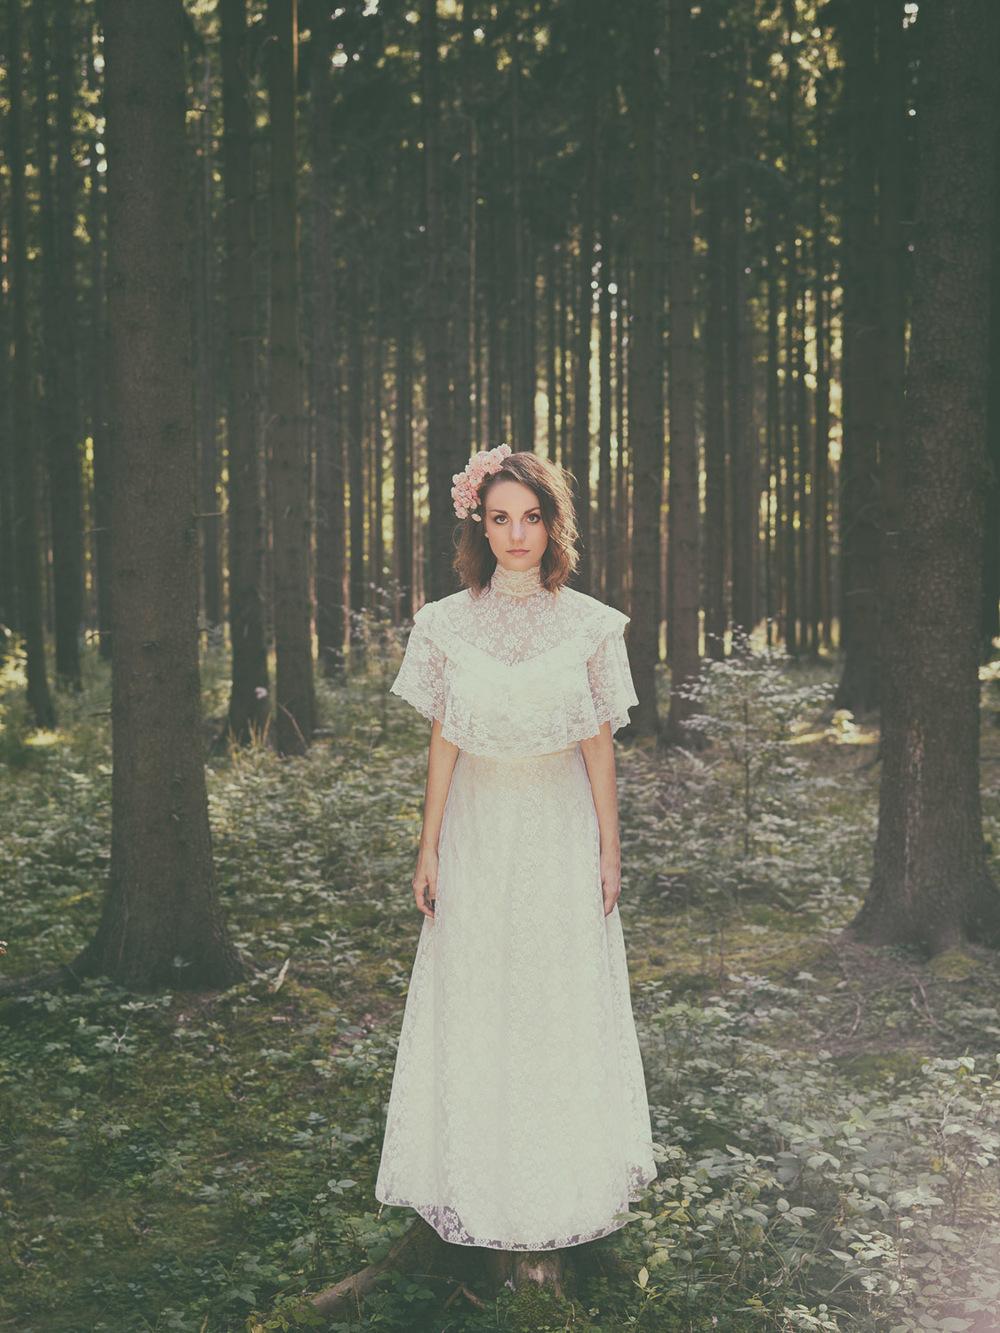 stlouis_wedding_photography_CF007138.jpg